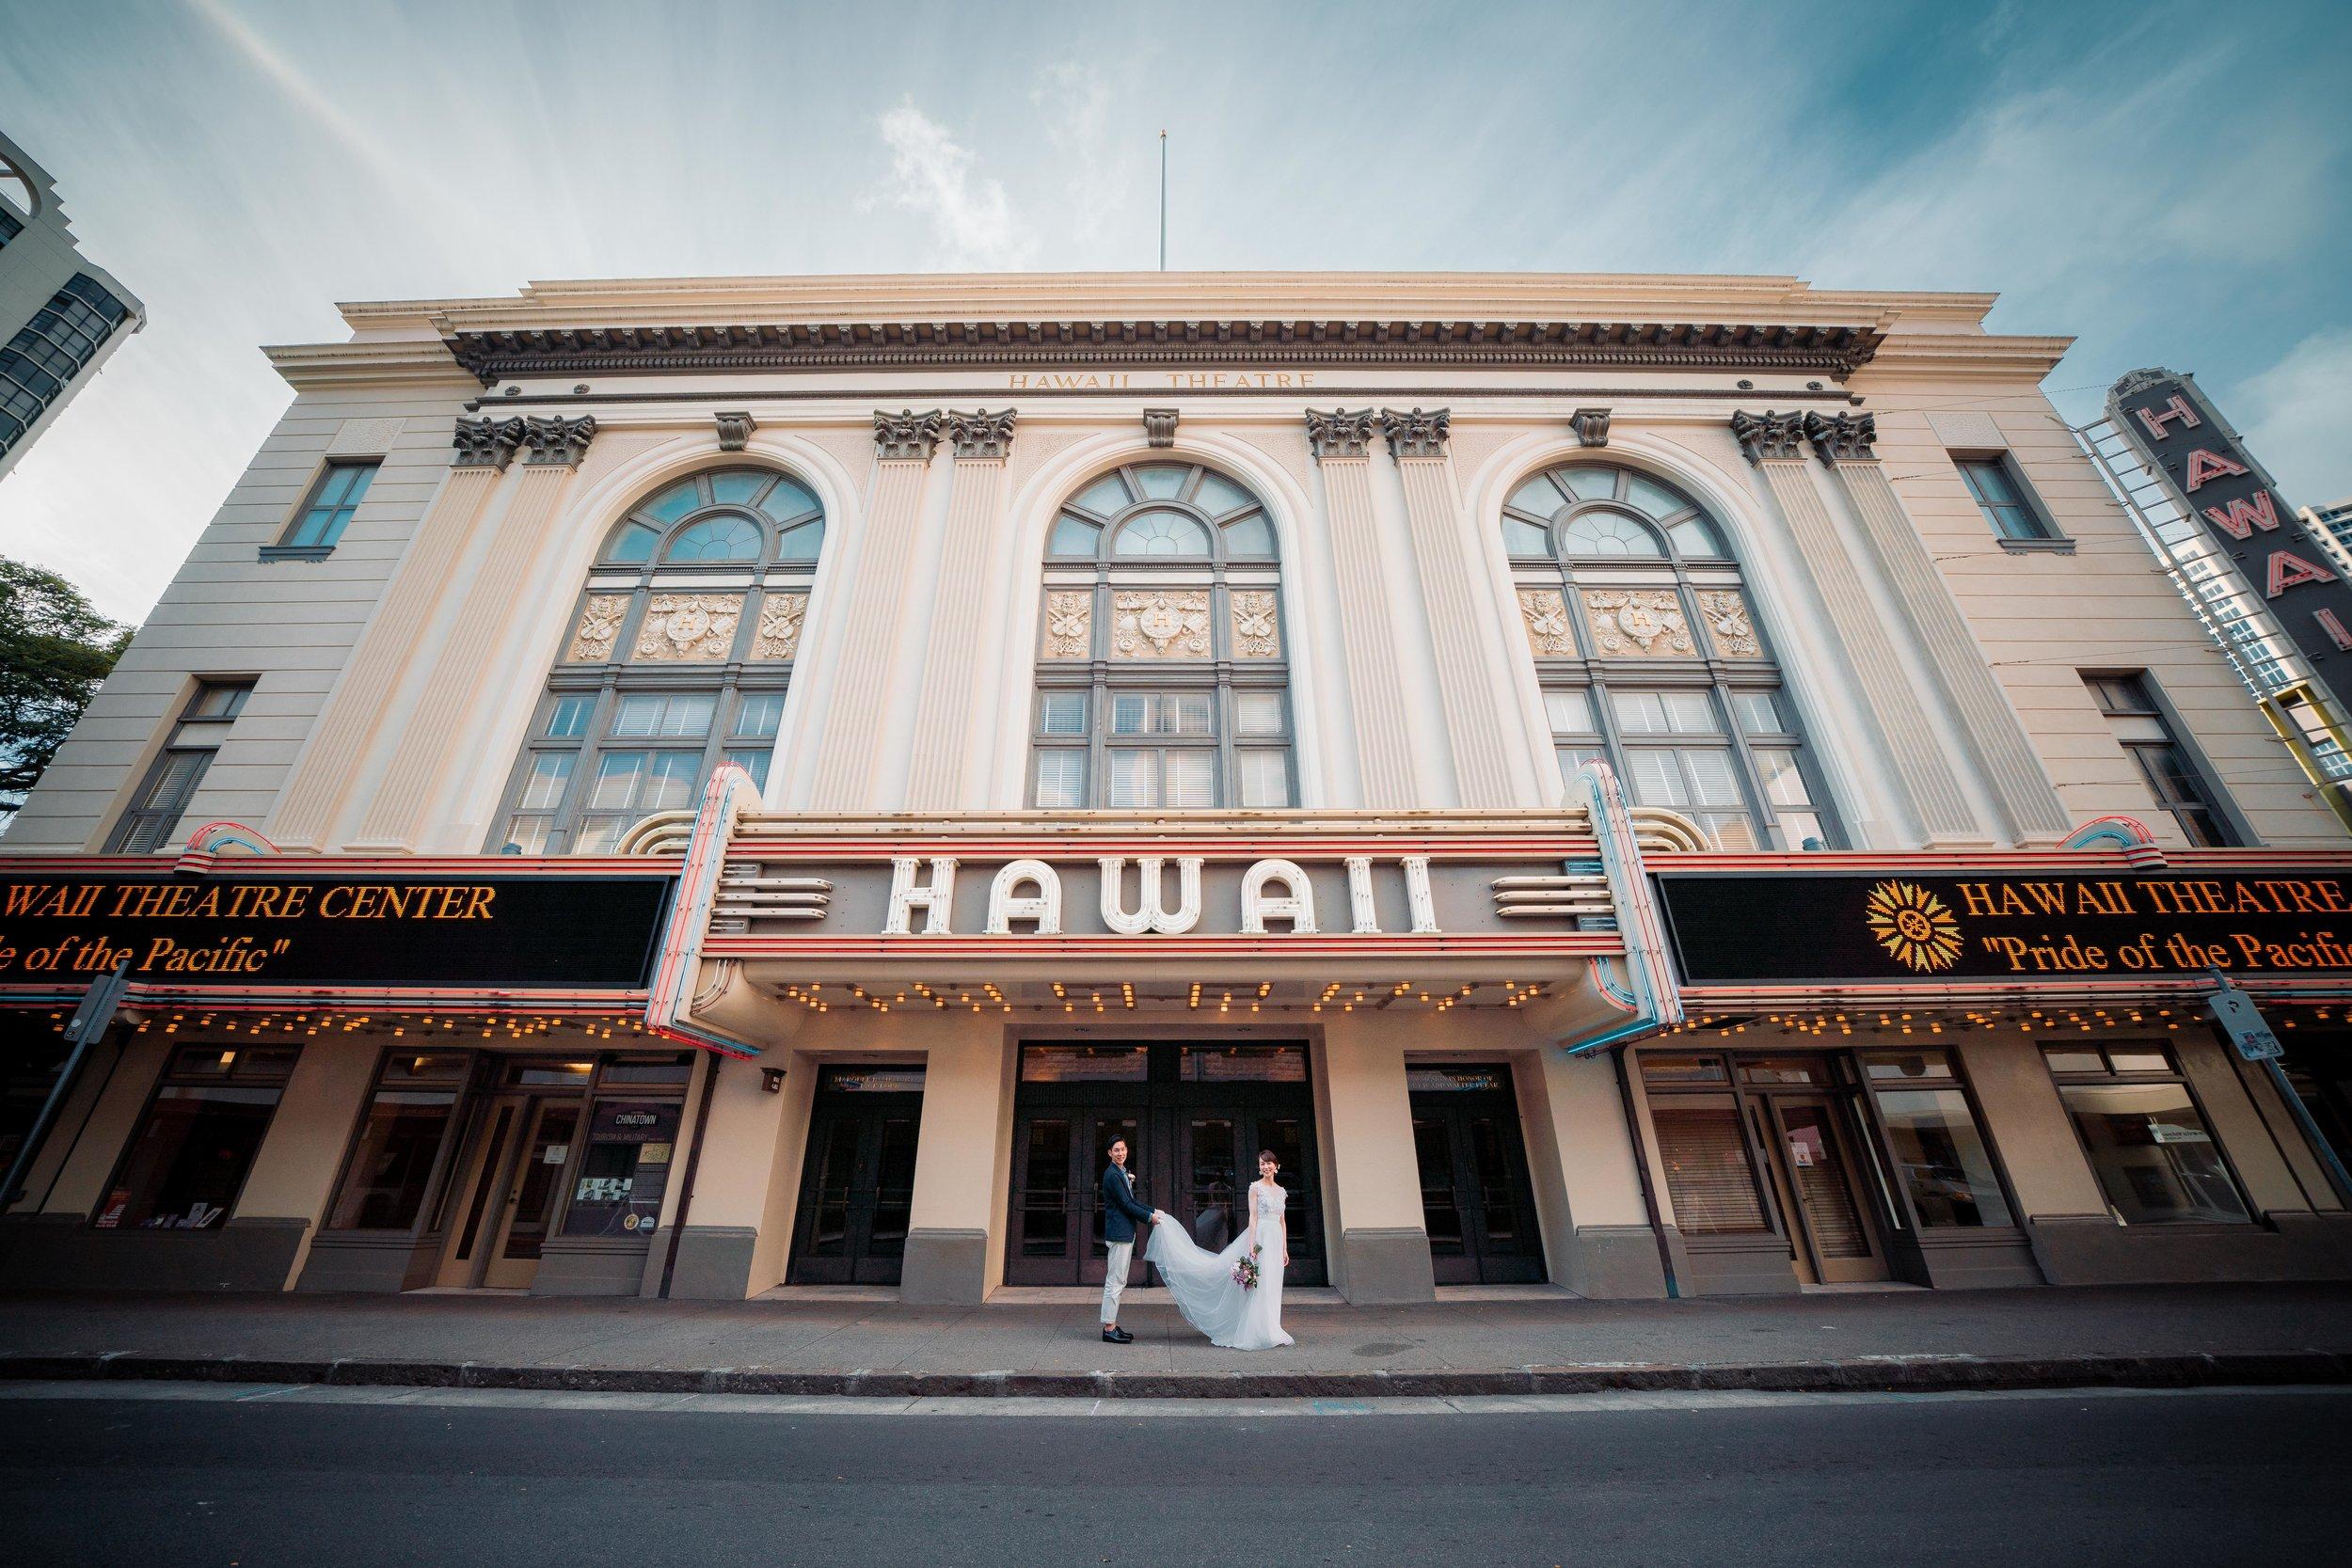 Toshi Takahashi Hawaii Wedding Photographer Downtown Hawaii Theater.jpg